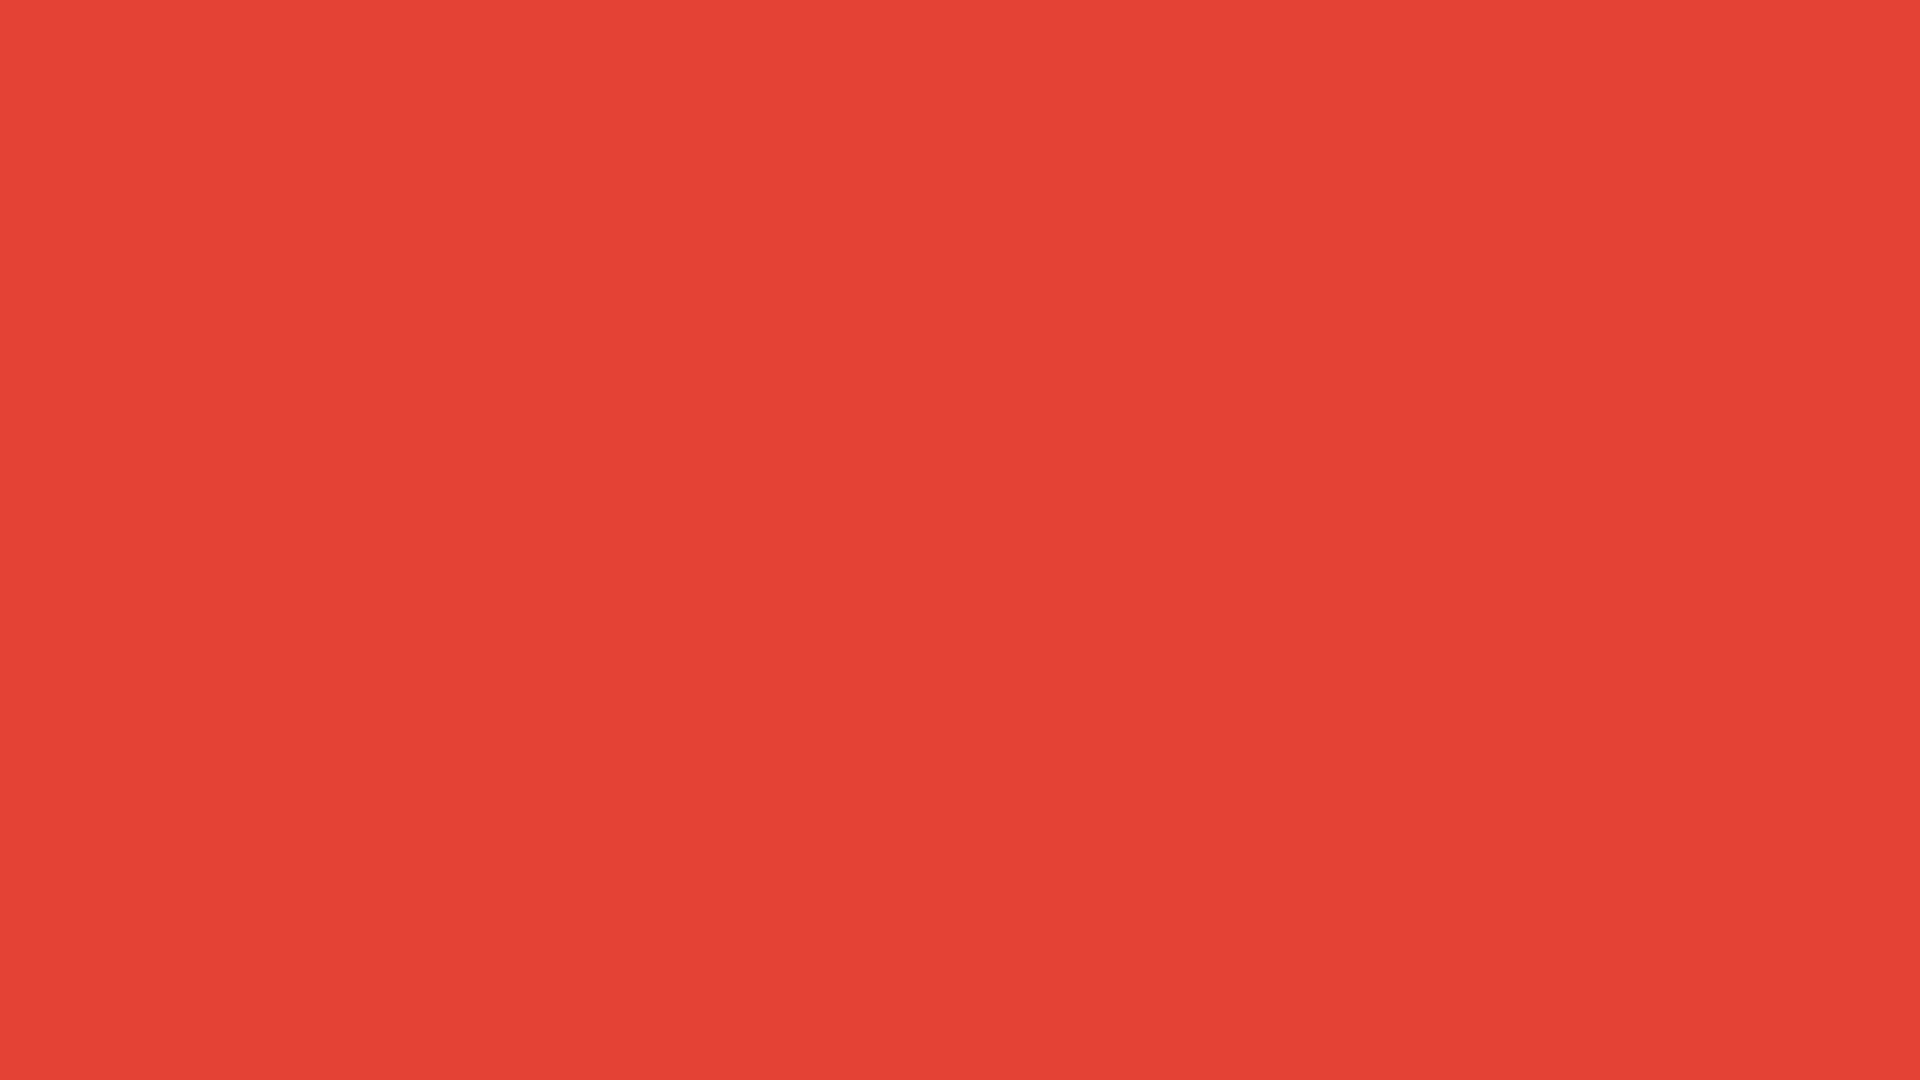 1920x1080 Vermilion Cinnabar Solid Color Background